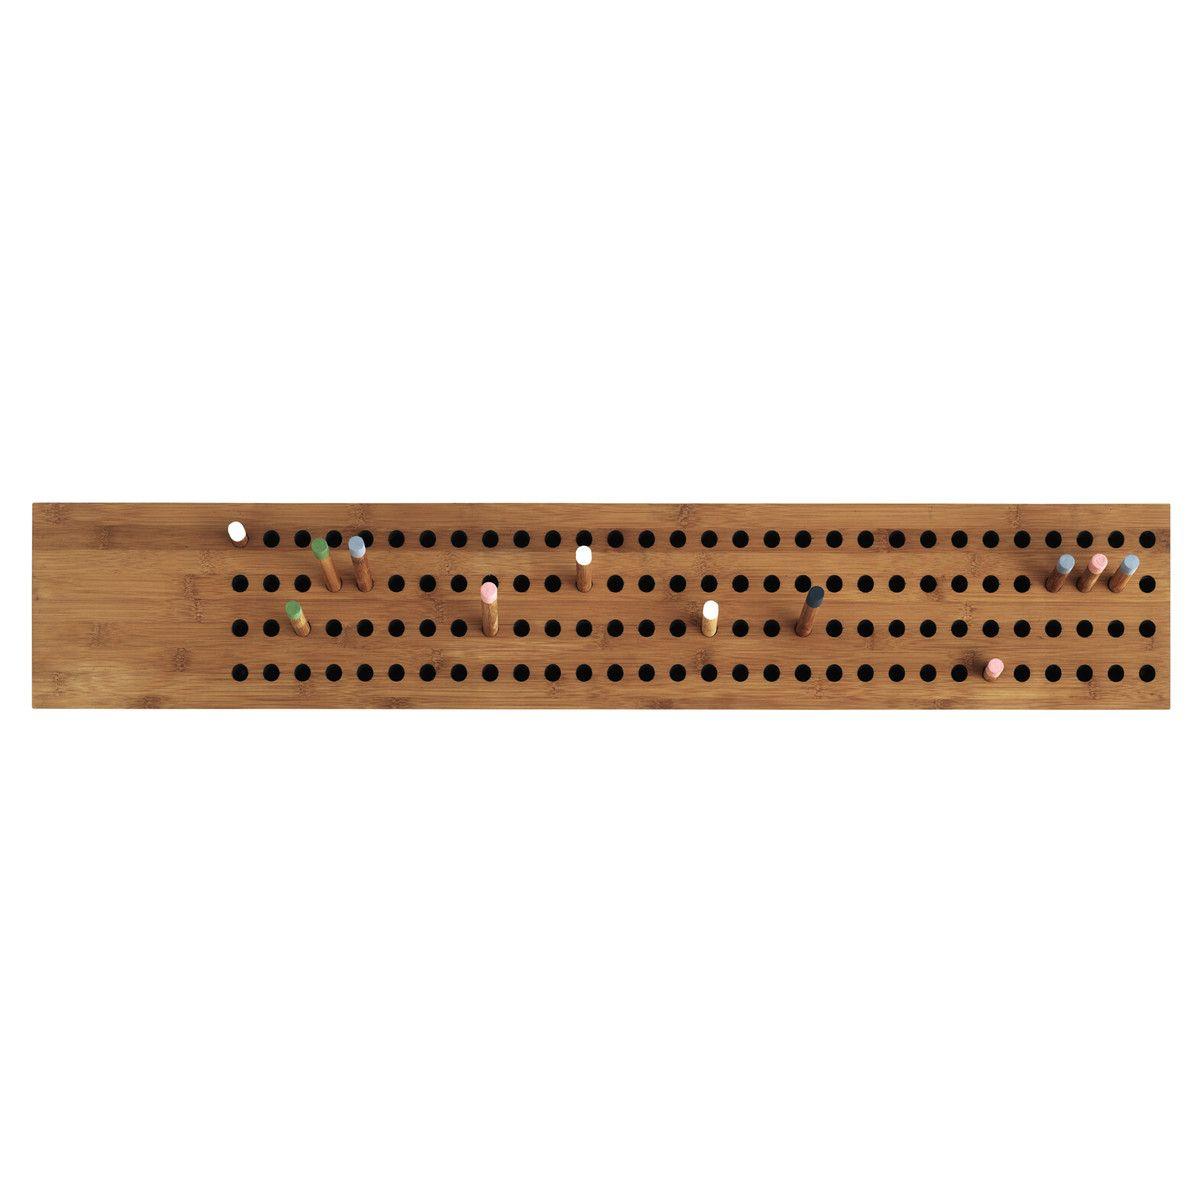 We Do Wood Aps We Do Wood Scoreboard Garderobe Horizontal Bambus